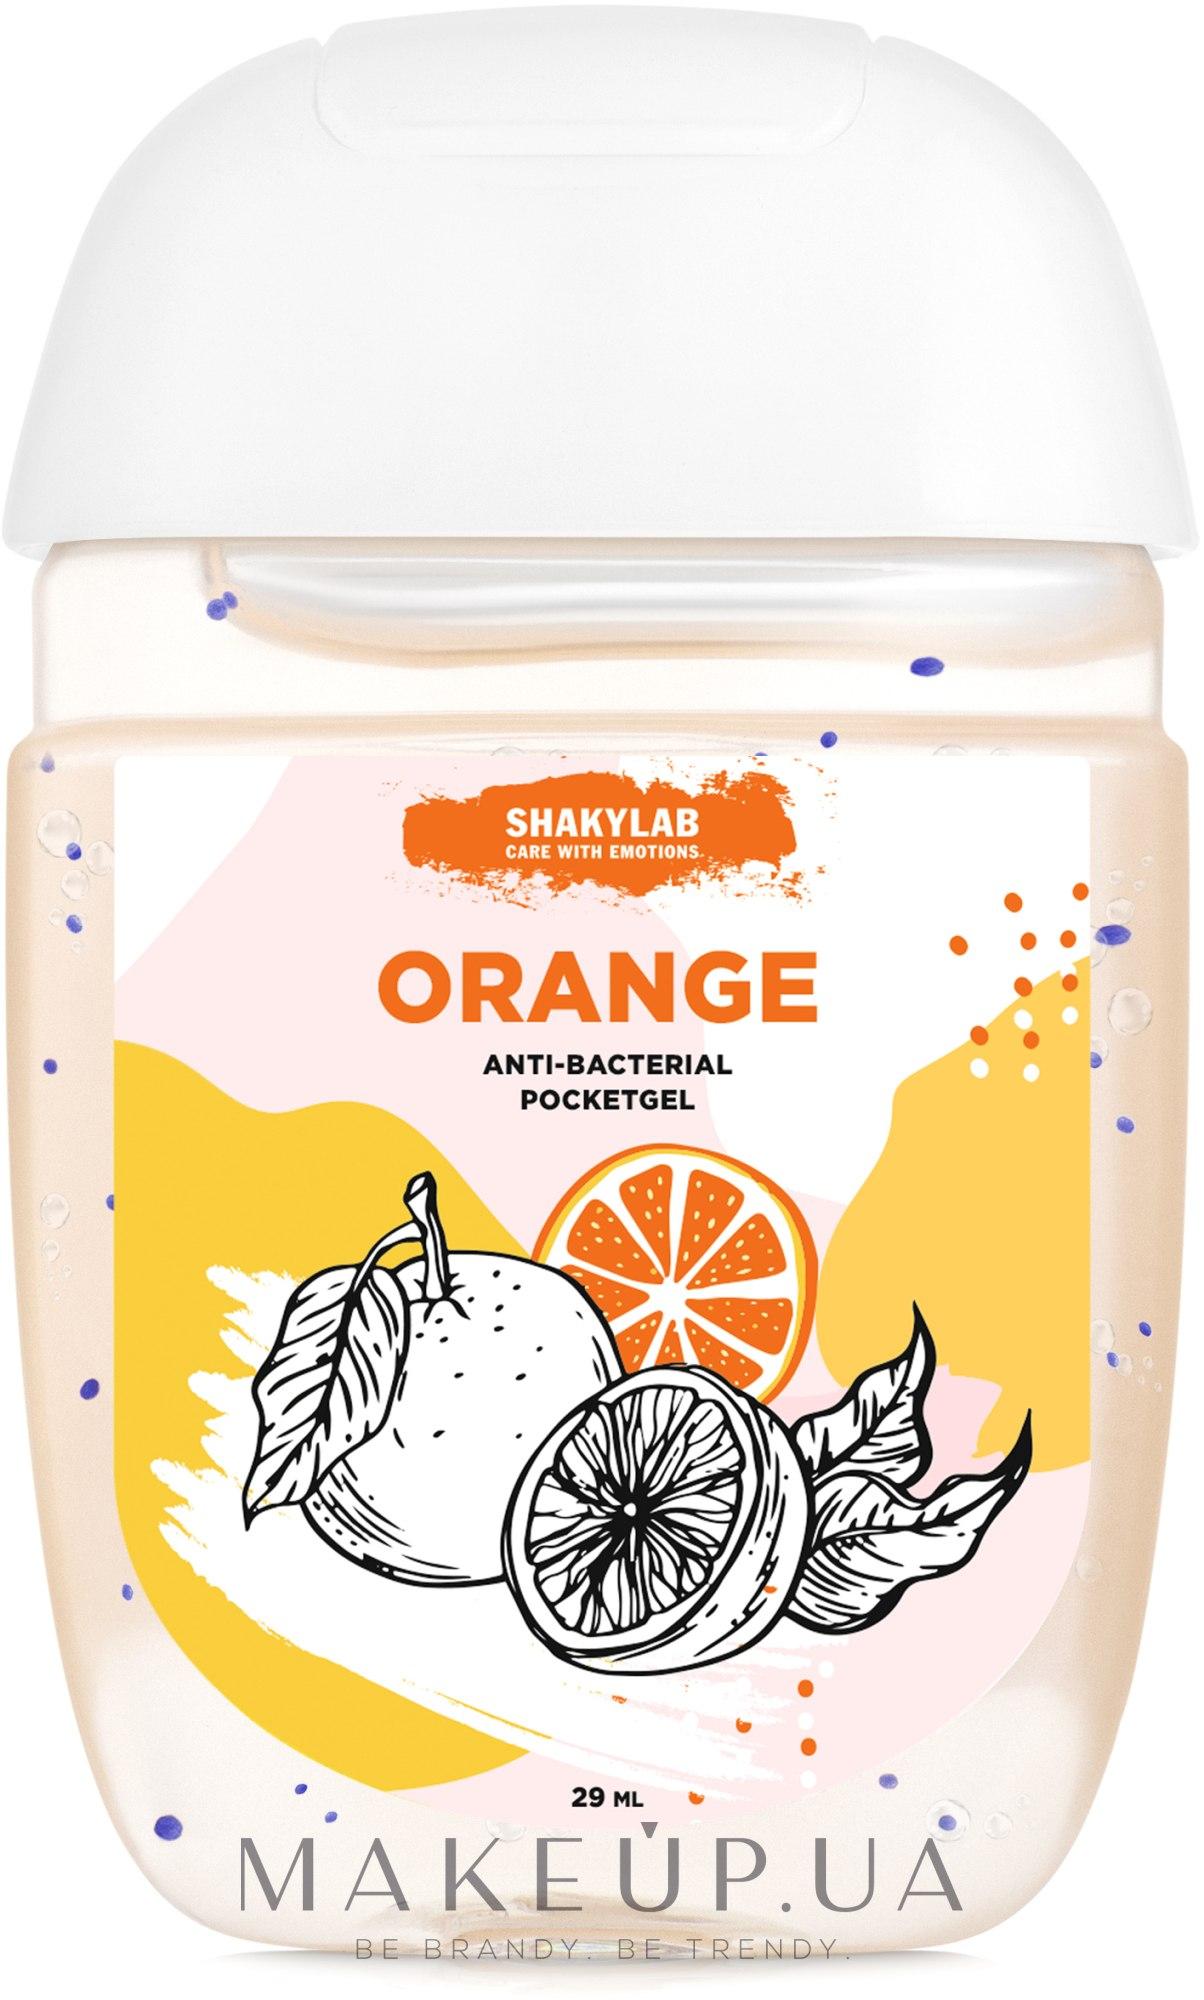 "Антибактериальный гель для рук ""Orange"" - SHAKYLAB Anti-Bacterial Pocket Gel — фото 29ml"